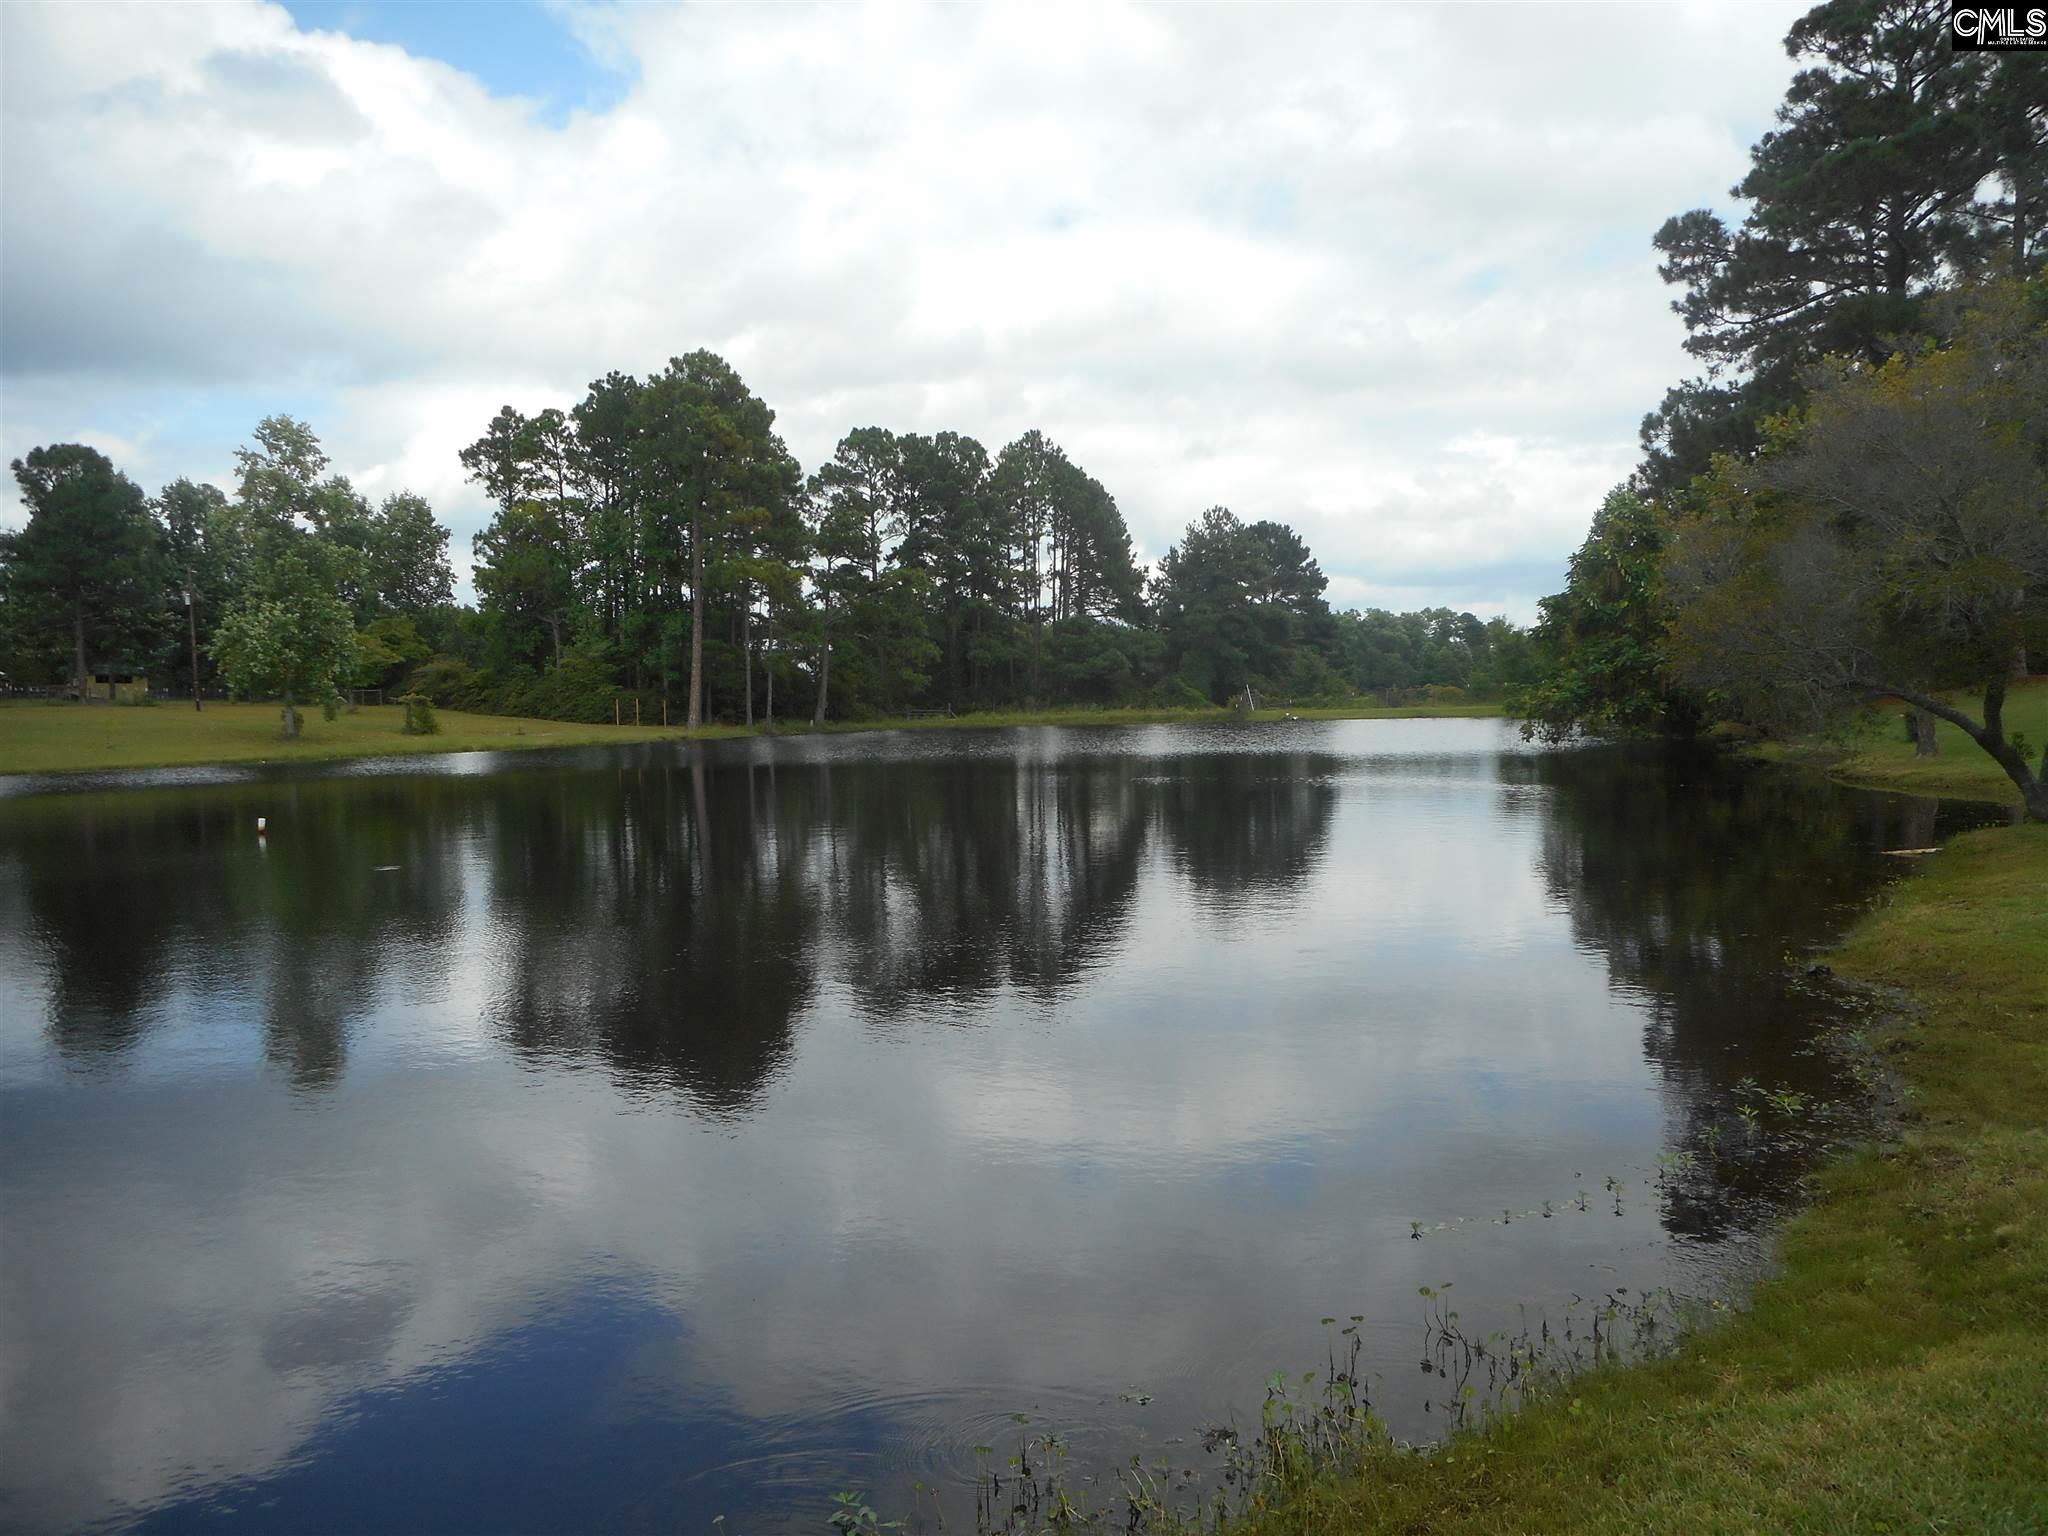 521 Rimer Pond Blythewood, SC 29016-9156